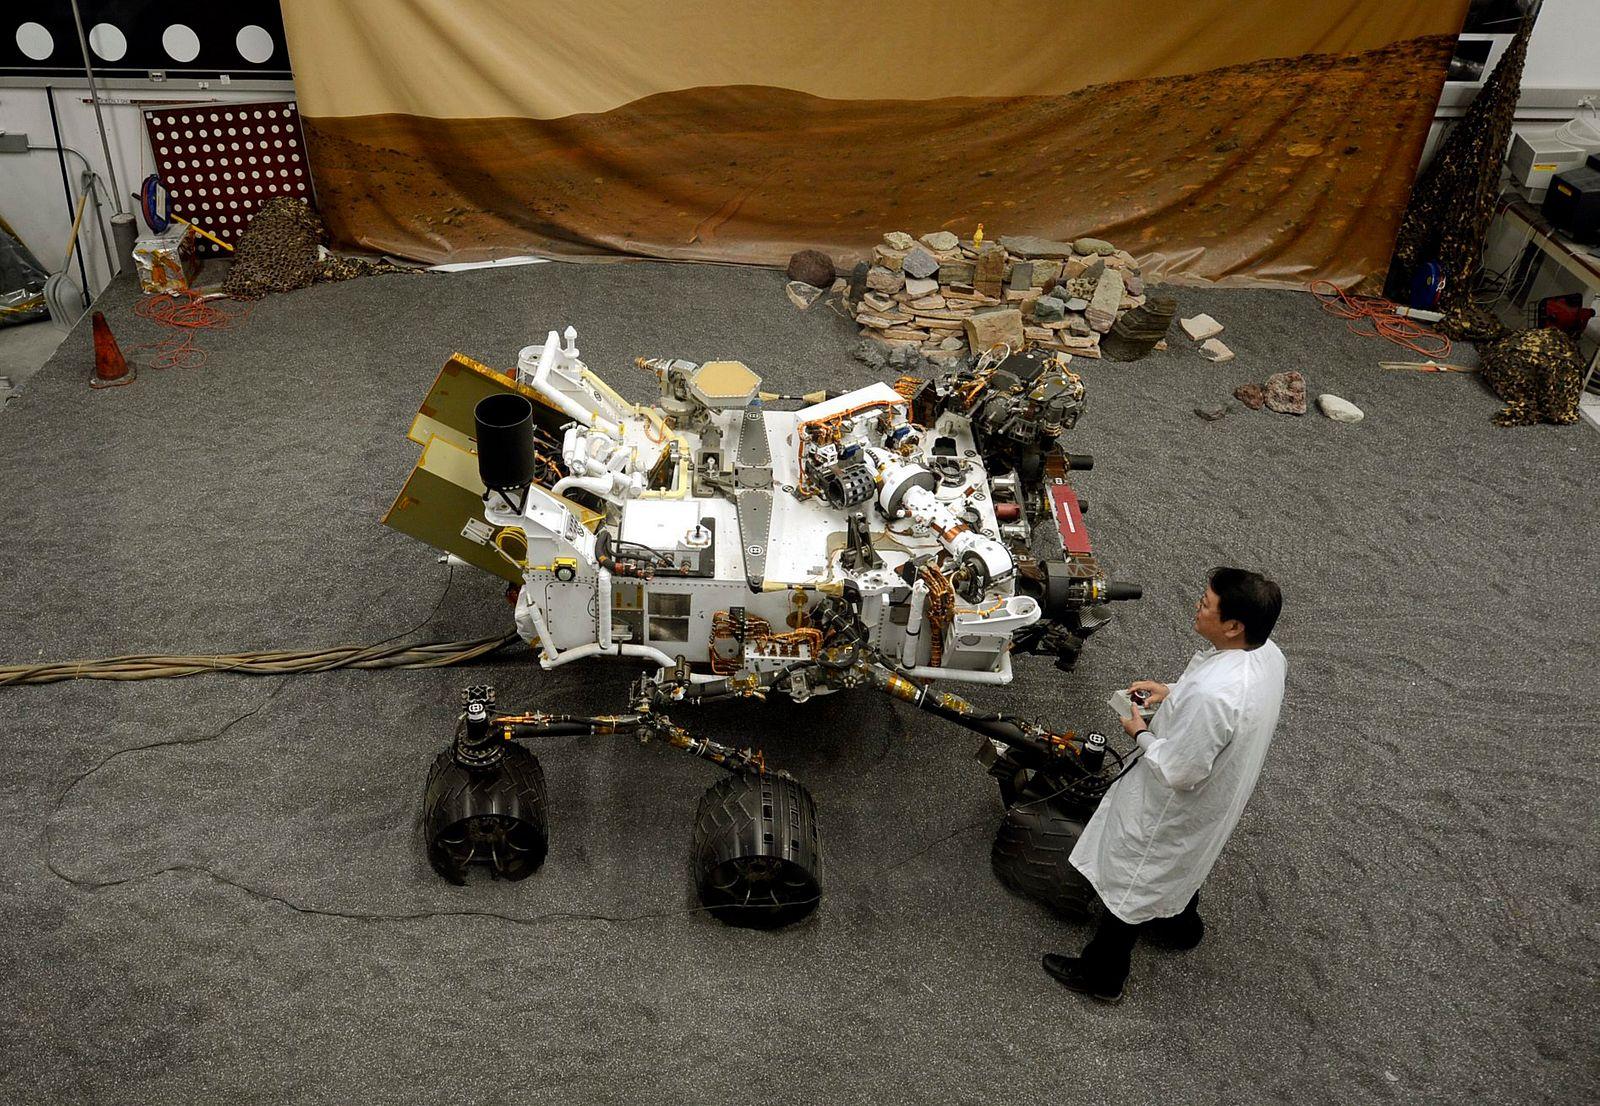 nasa curiosity landing - 1000×692